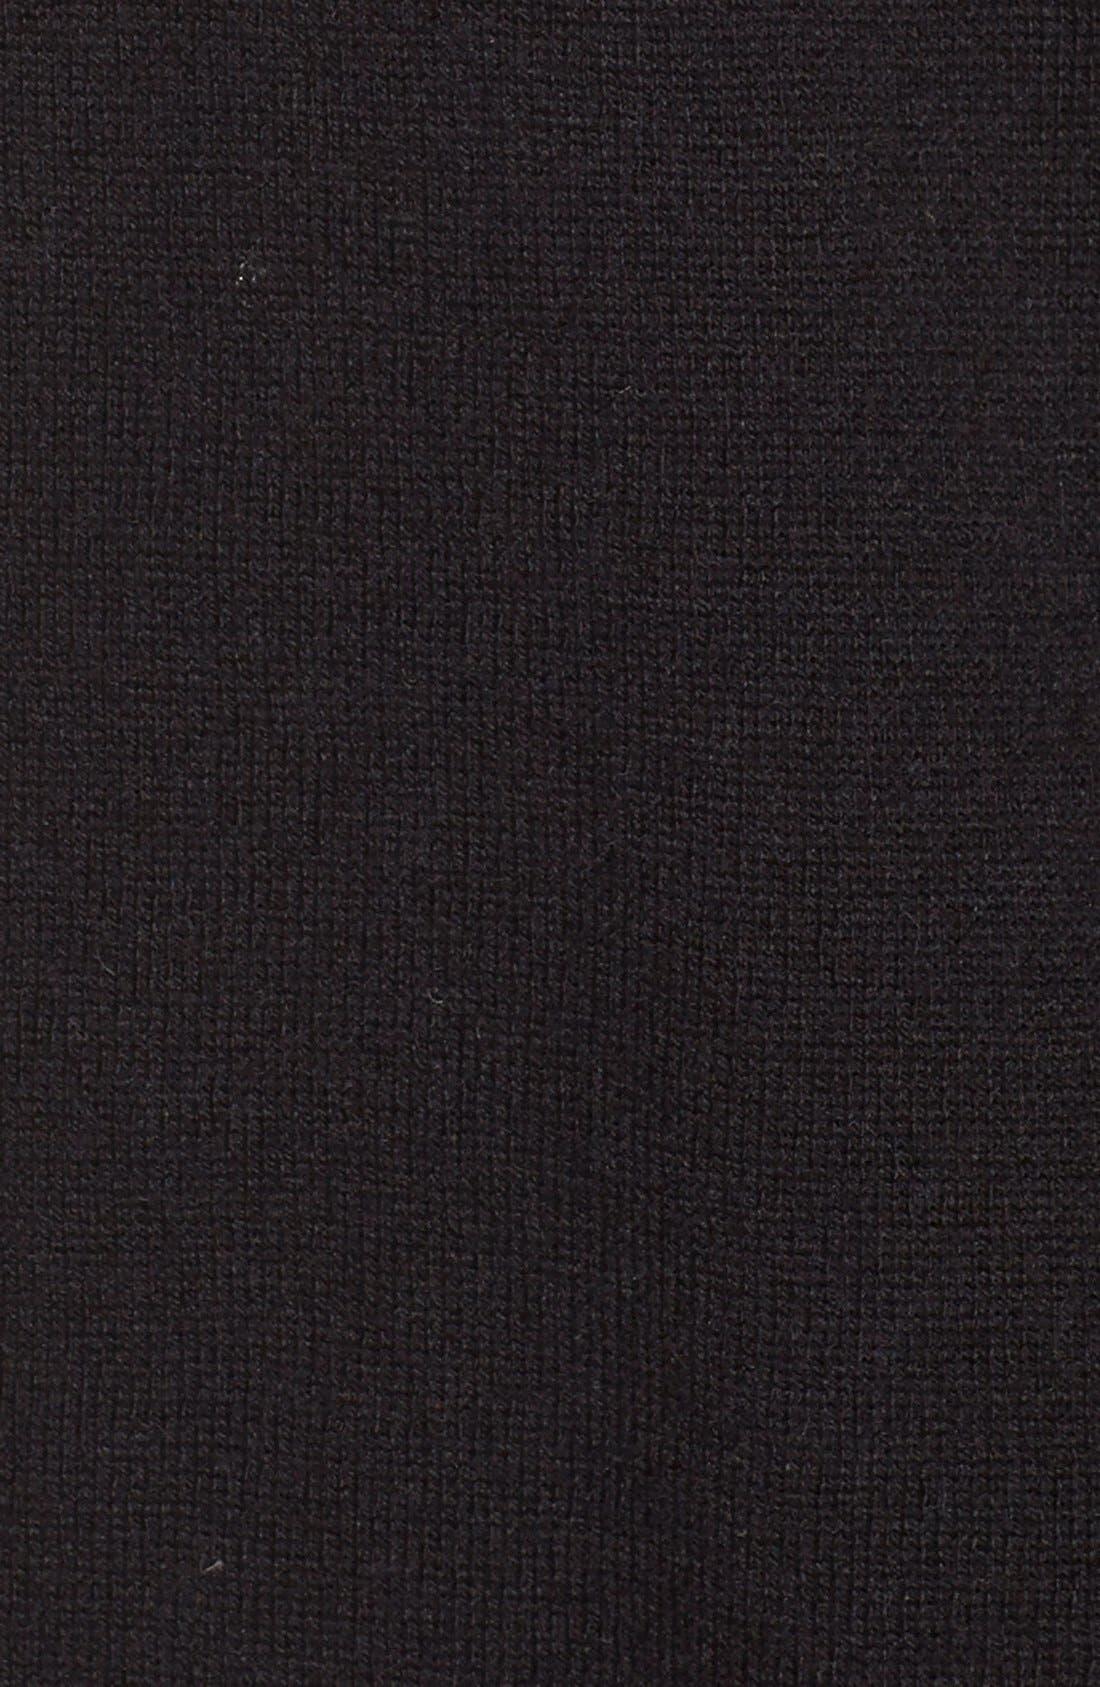 LongWrap Cardigan,                             Alternate thumbnail 5, color,                             Black